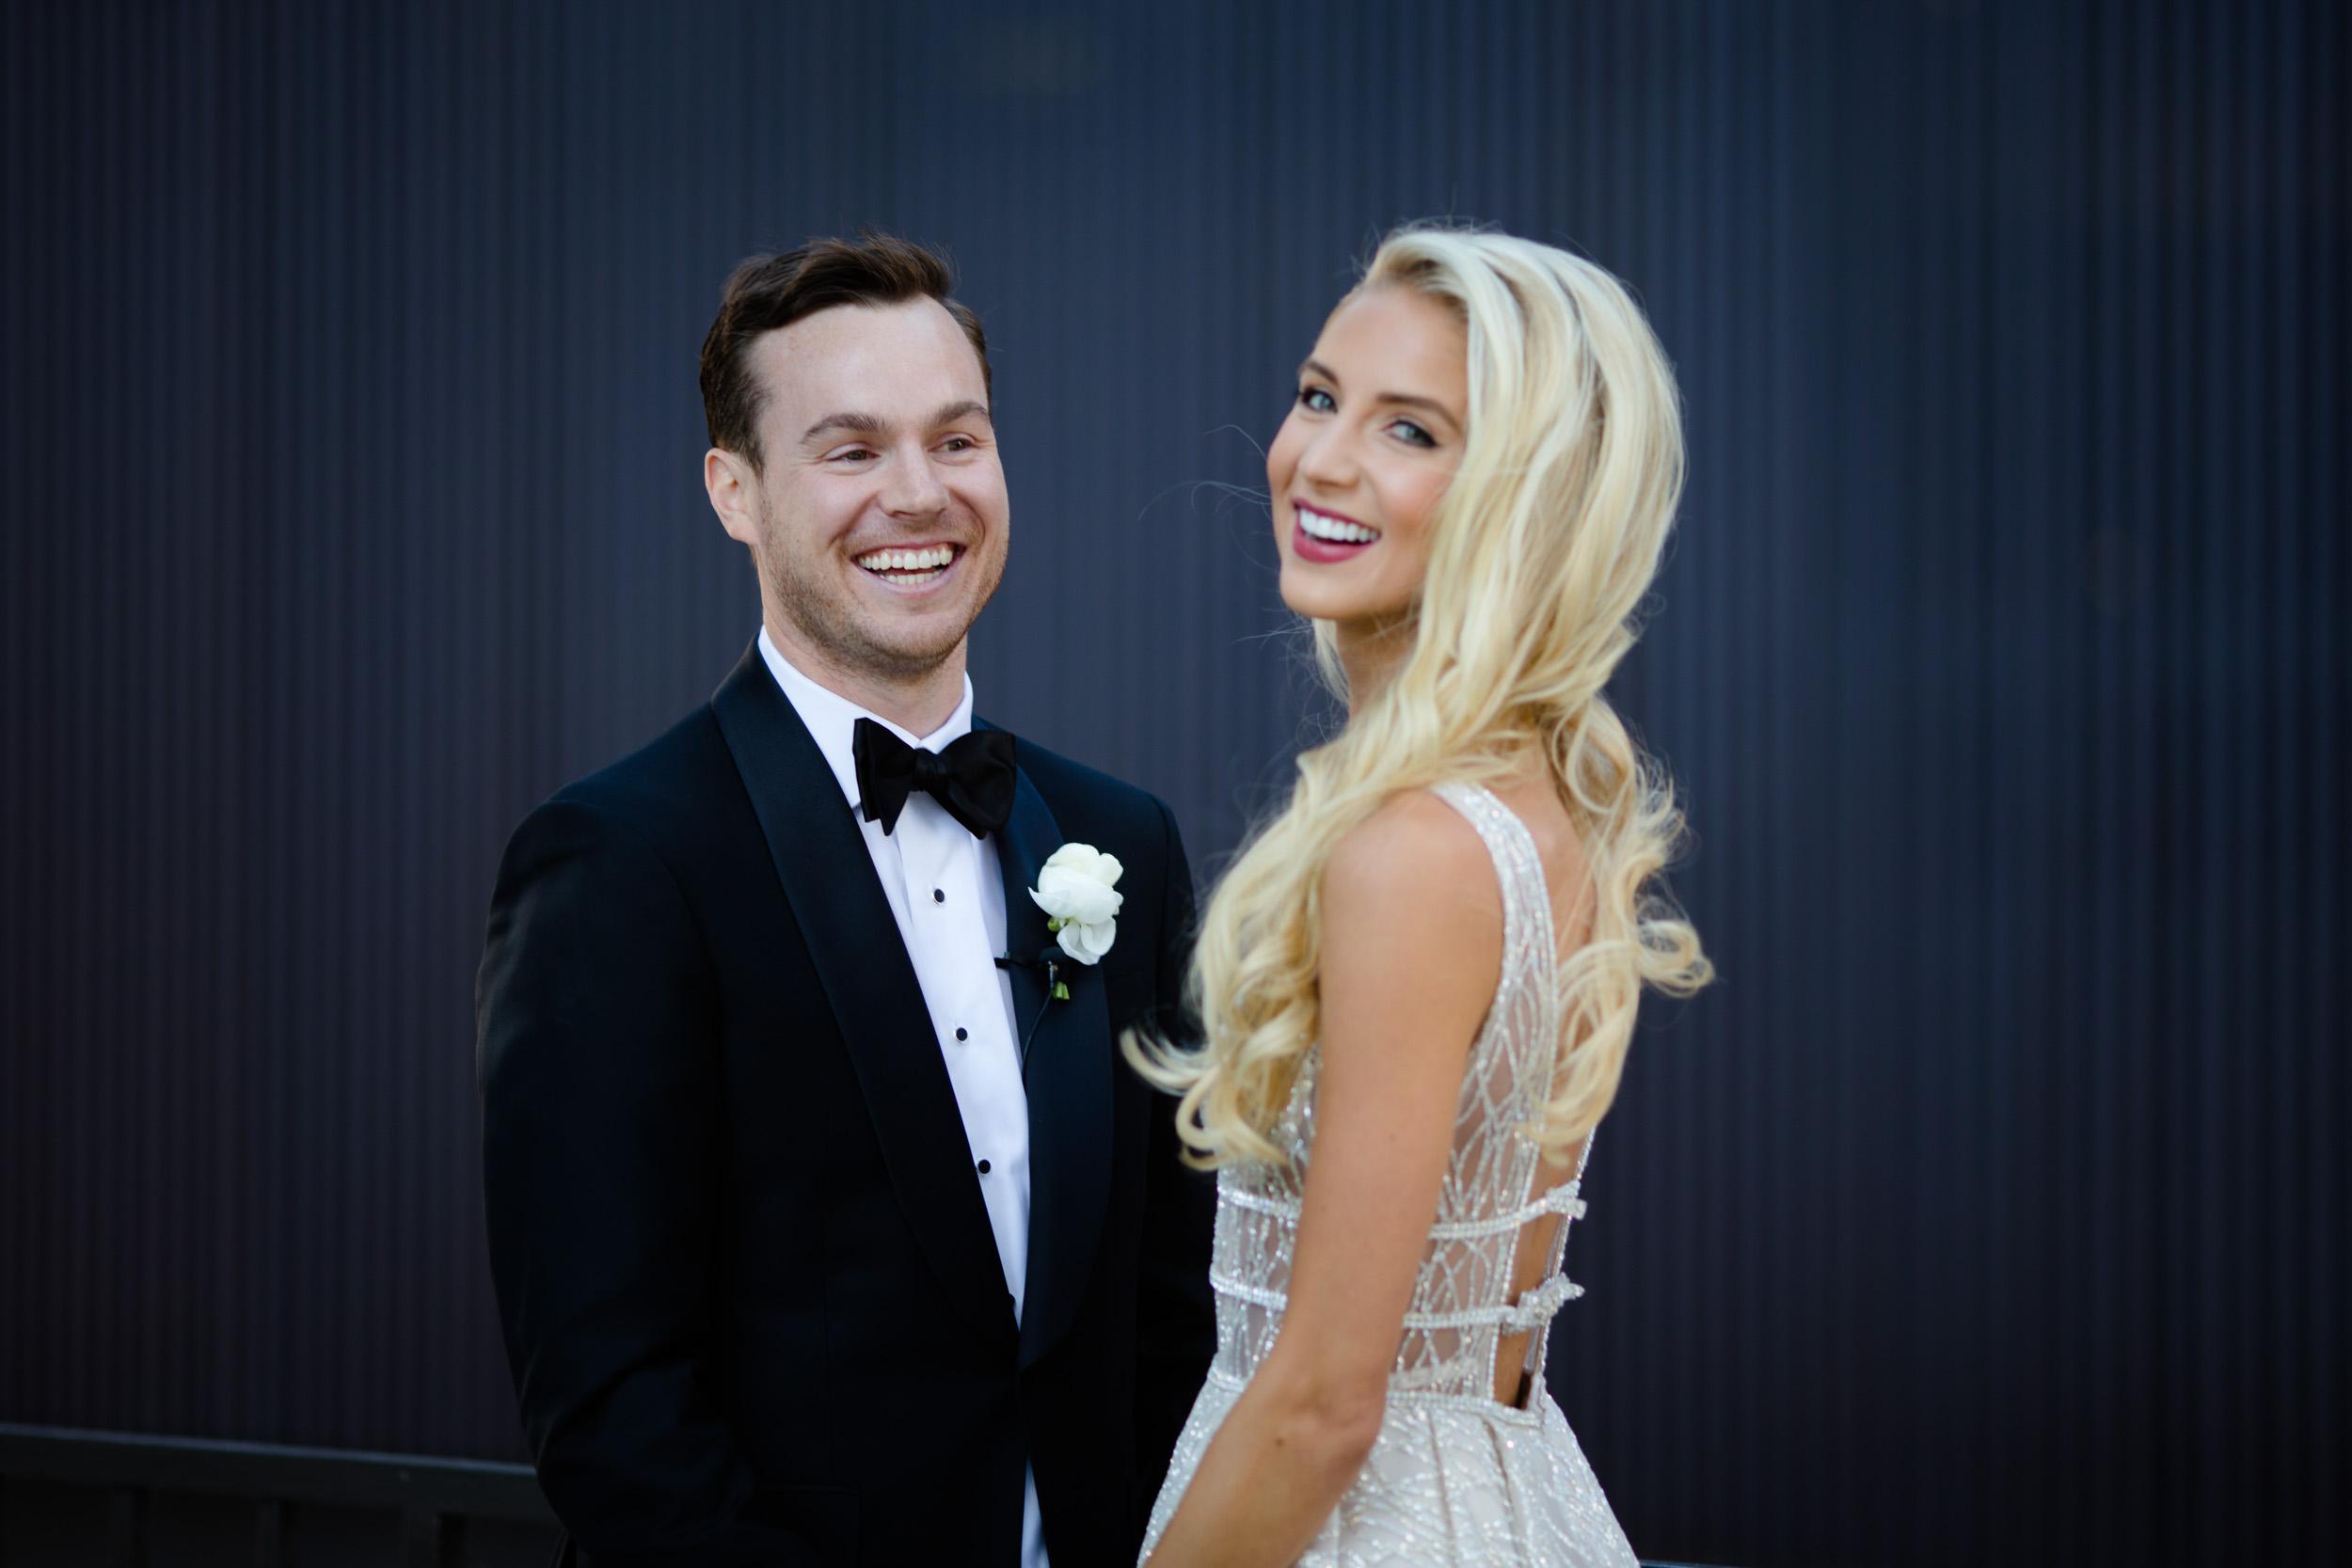 chicago-illuminating-co-wedding-photos-17.jpg